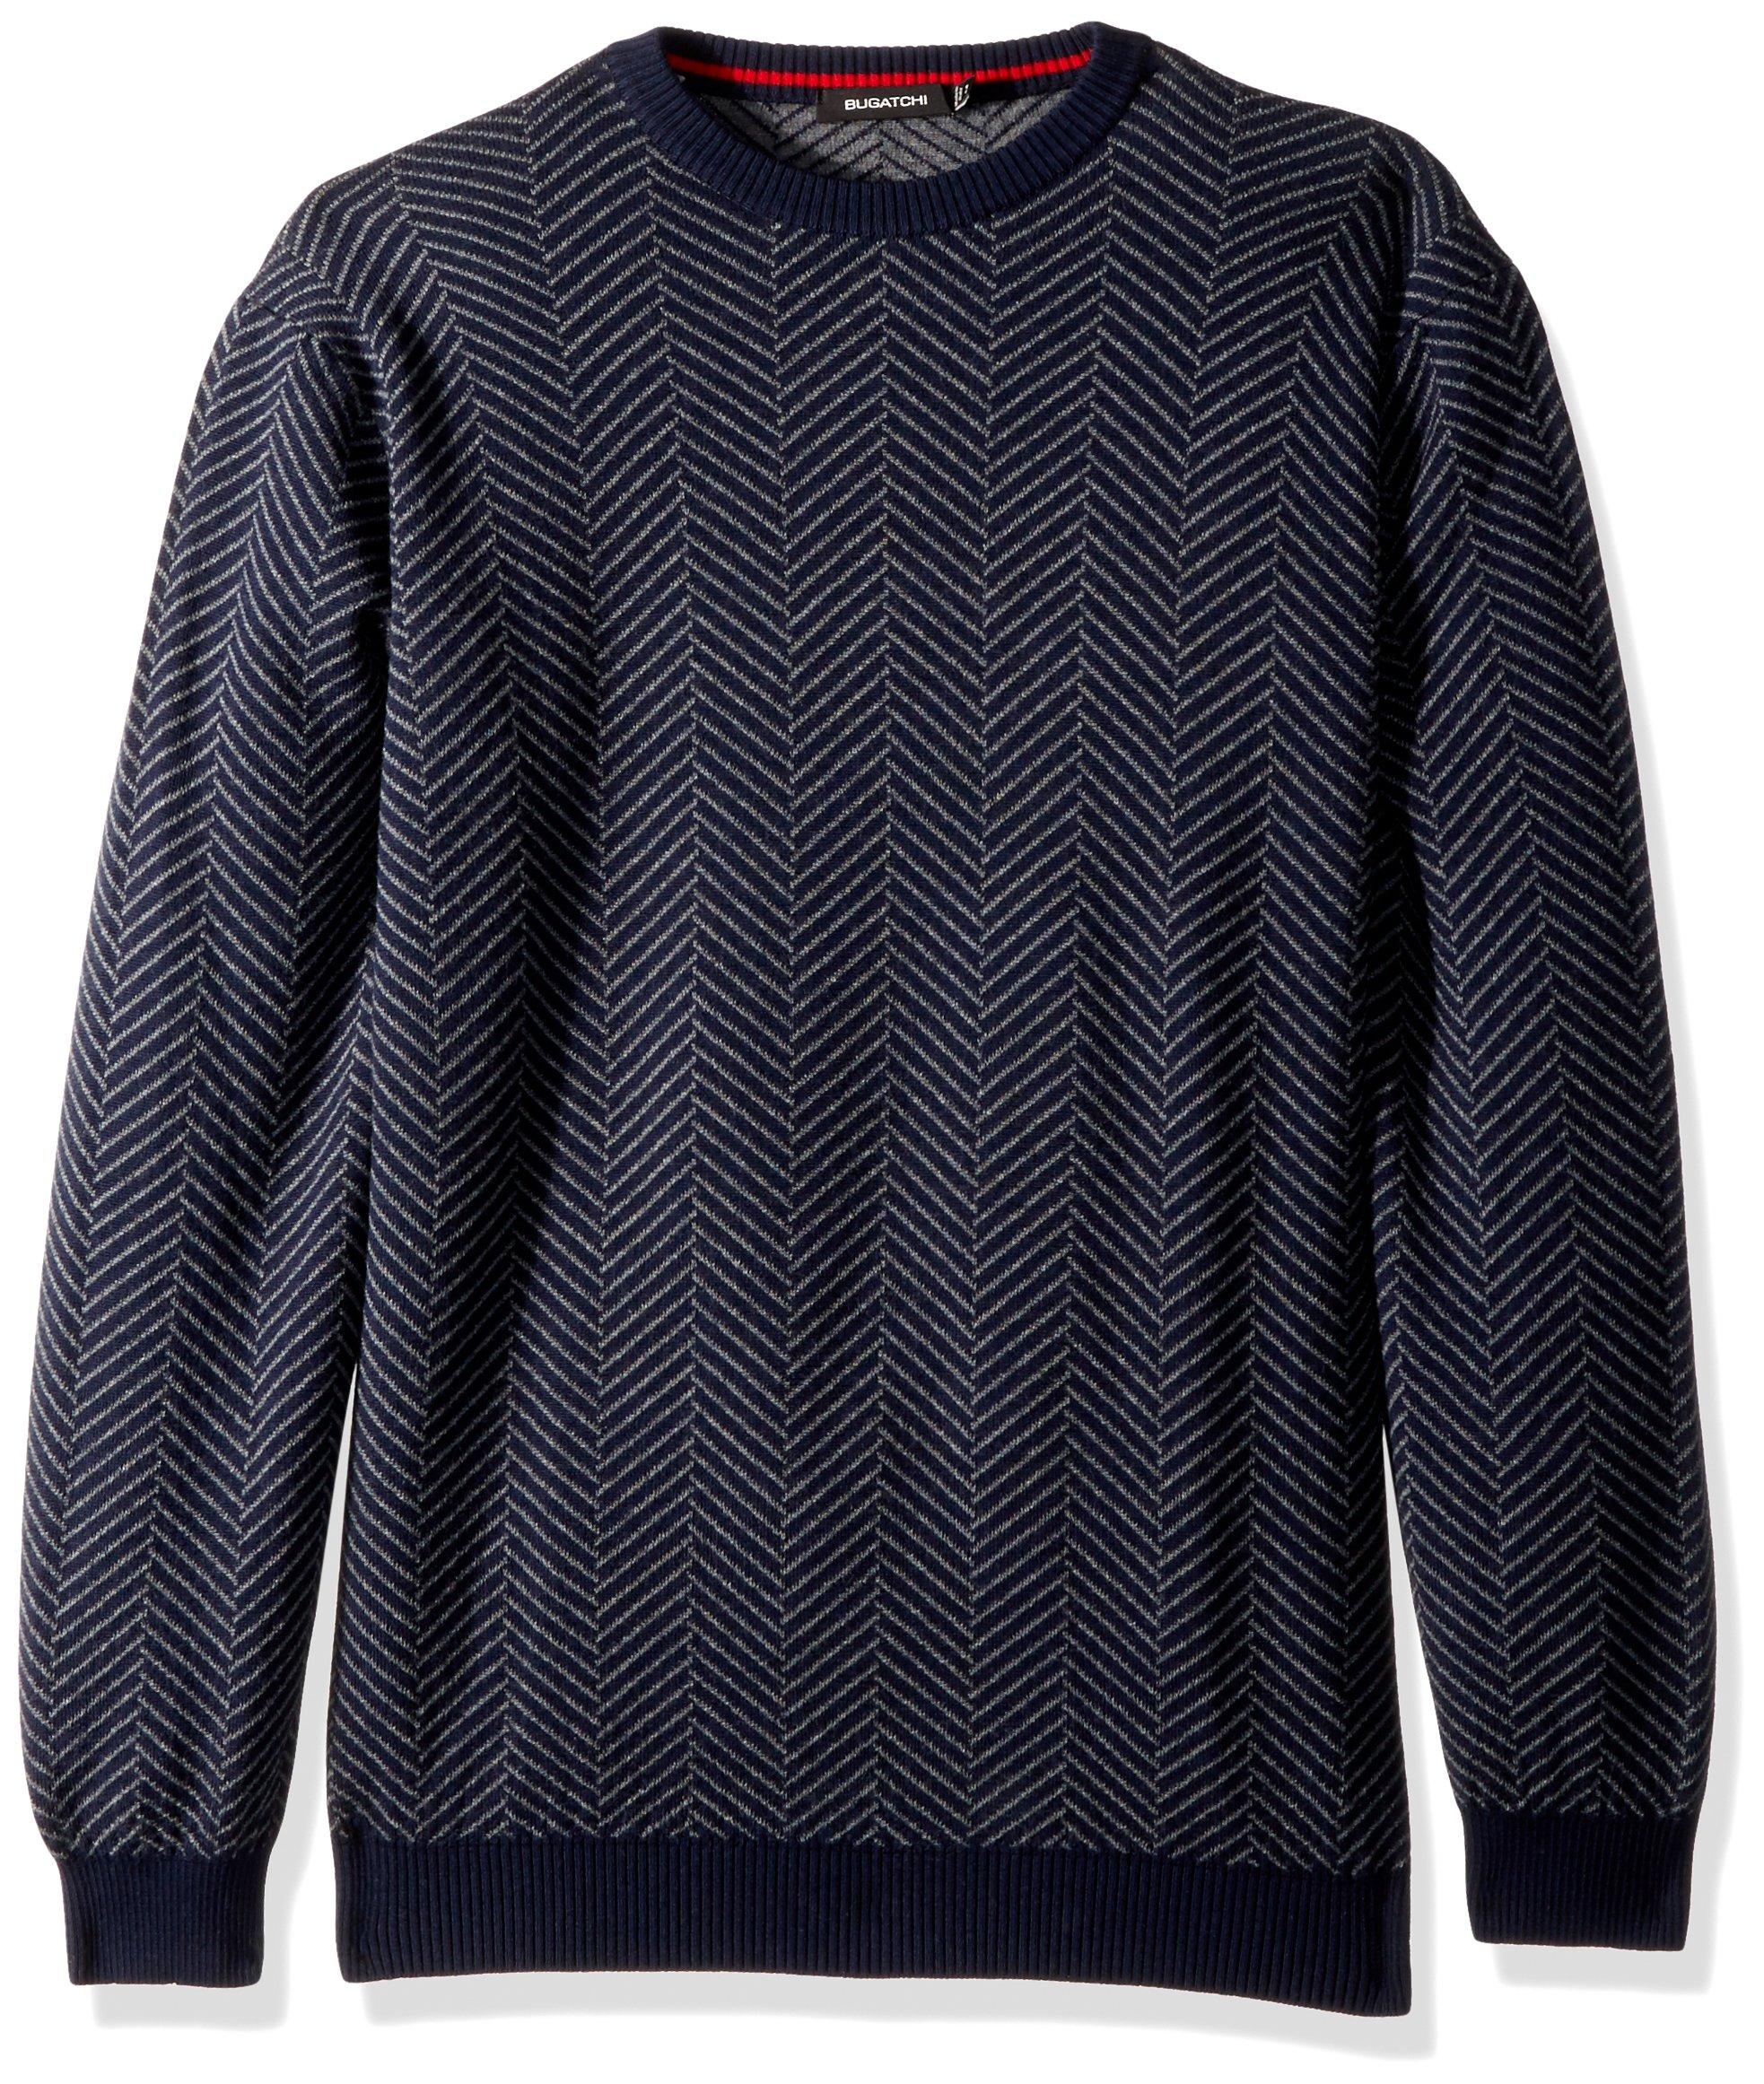 BUGATCHI Men's Extra Fine Merino Wool Crew Neck Sweater, Navy, Large